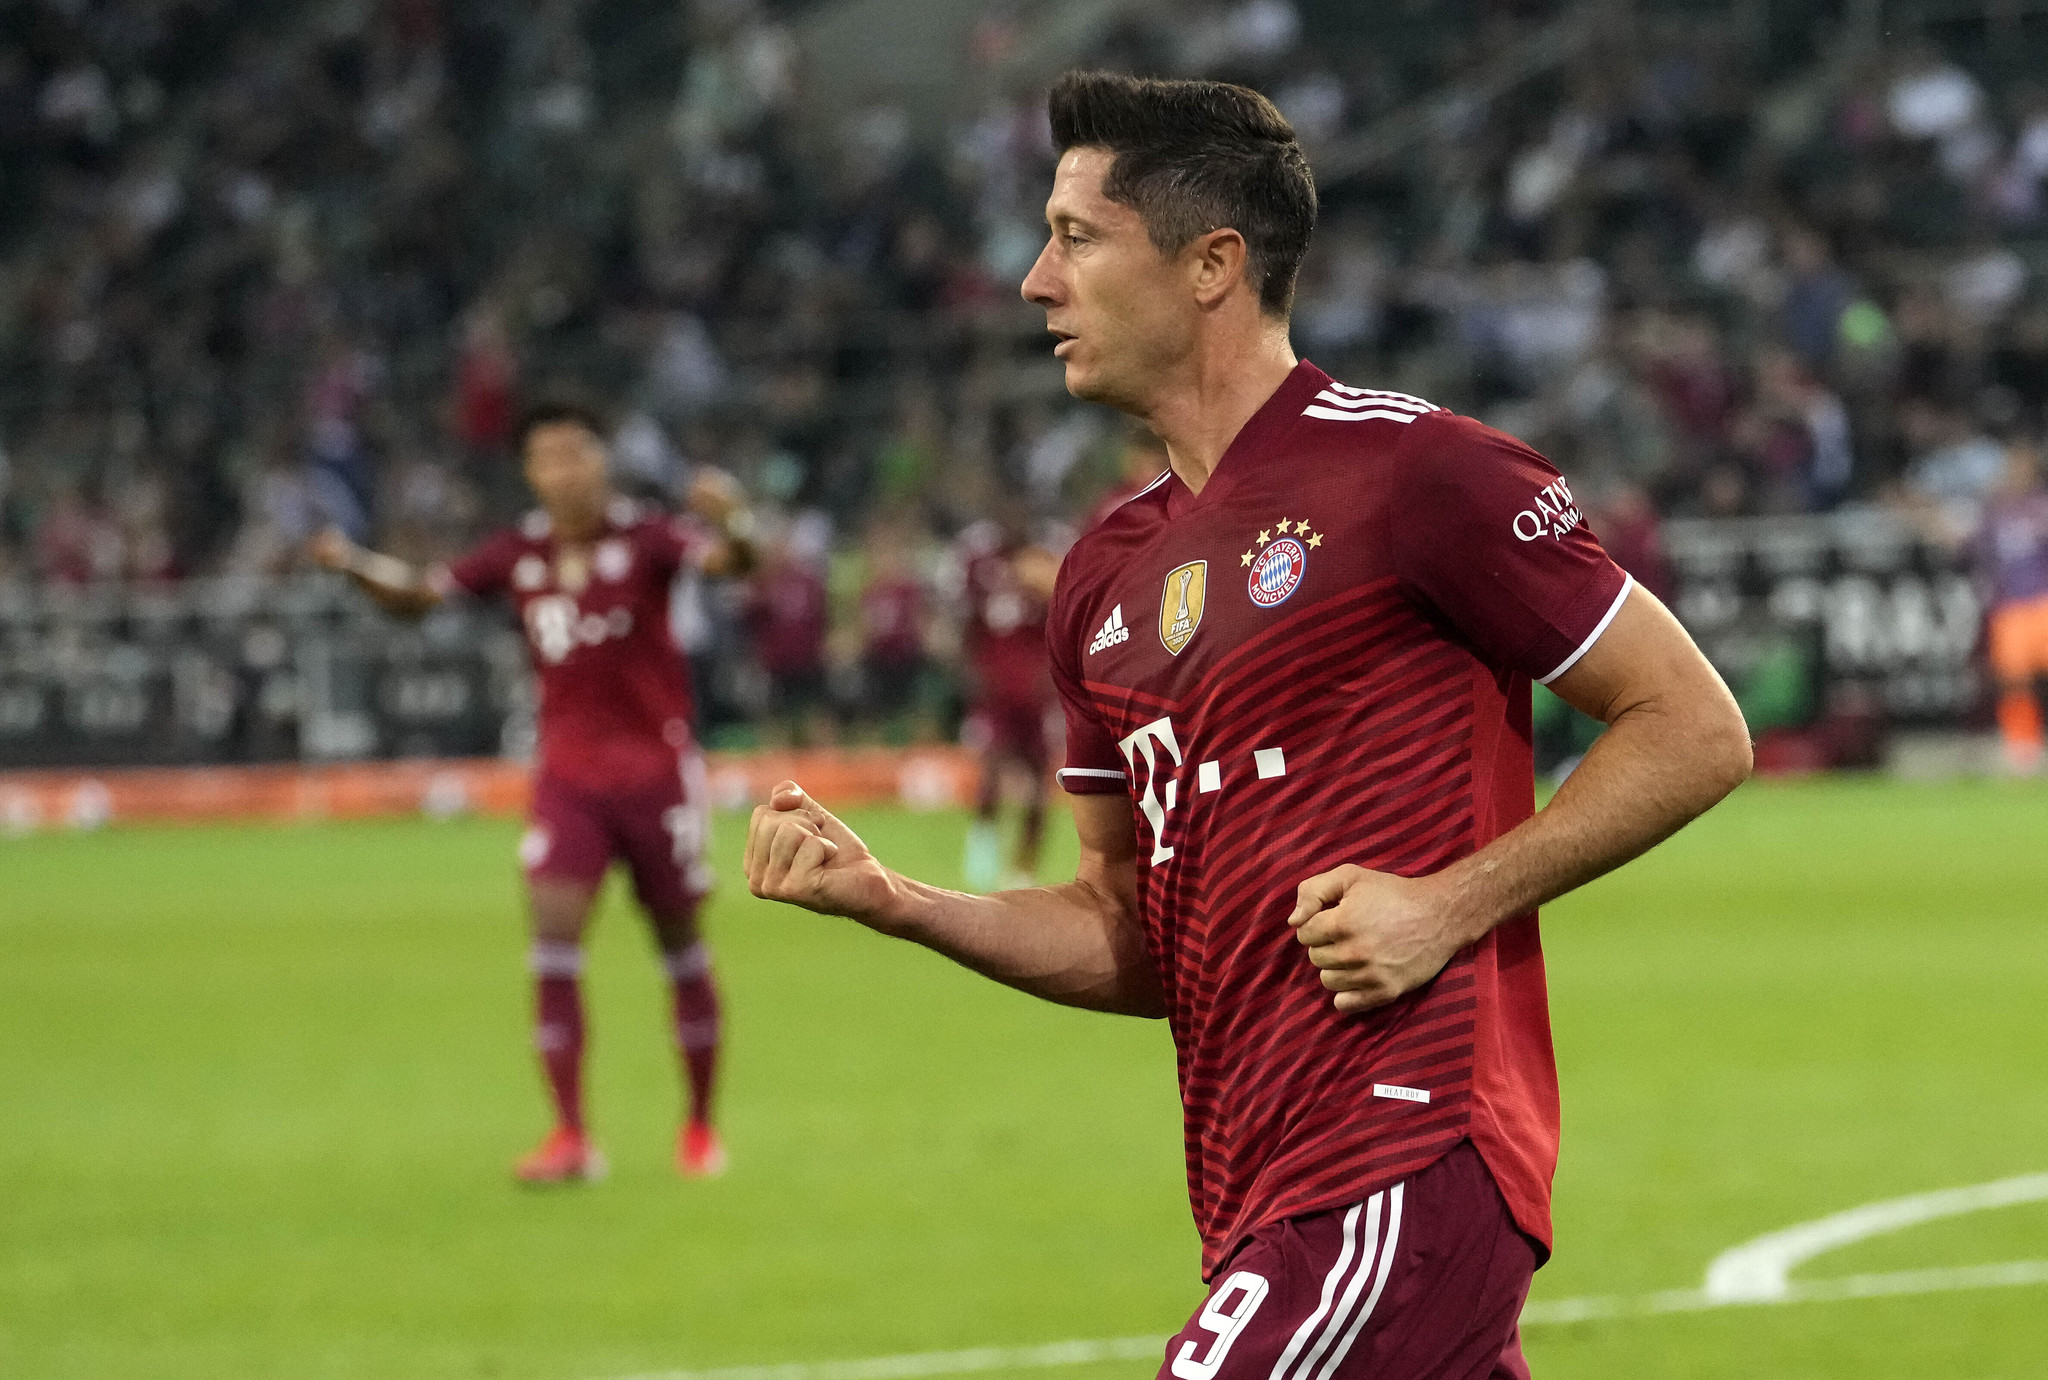 Bayern Múnich - Hertha en directo